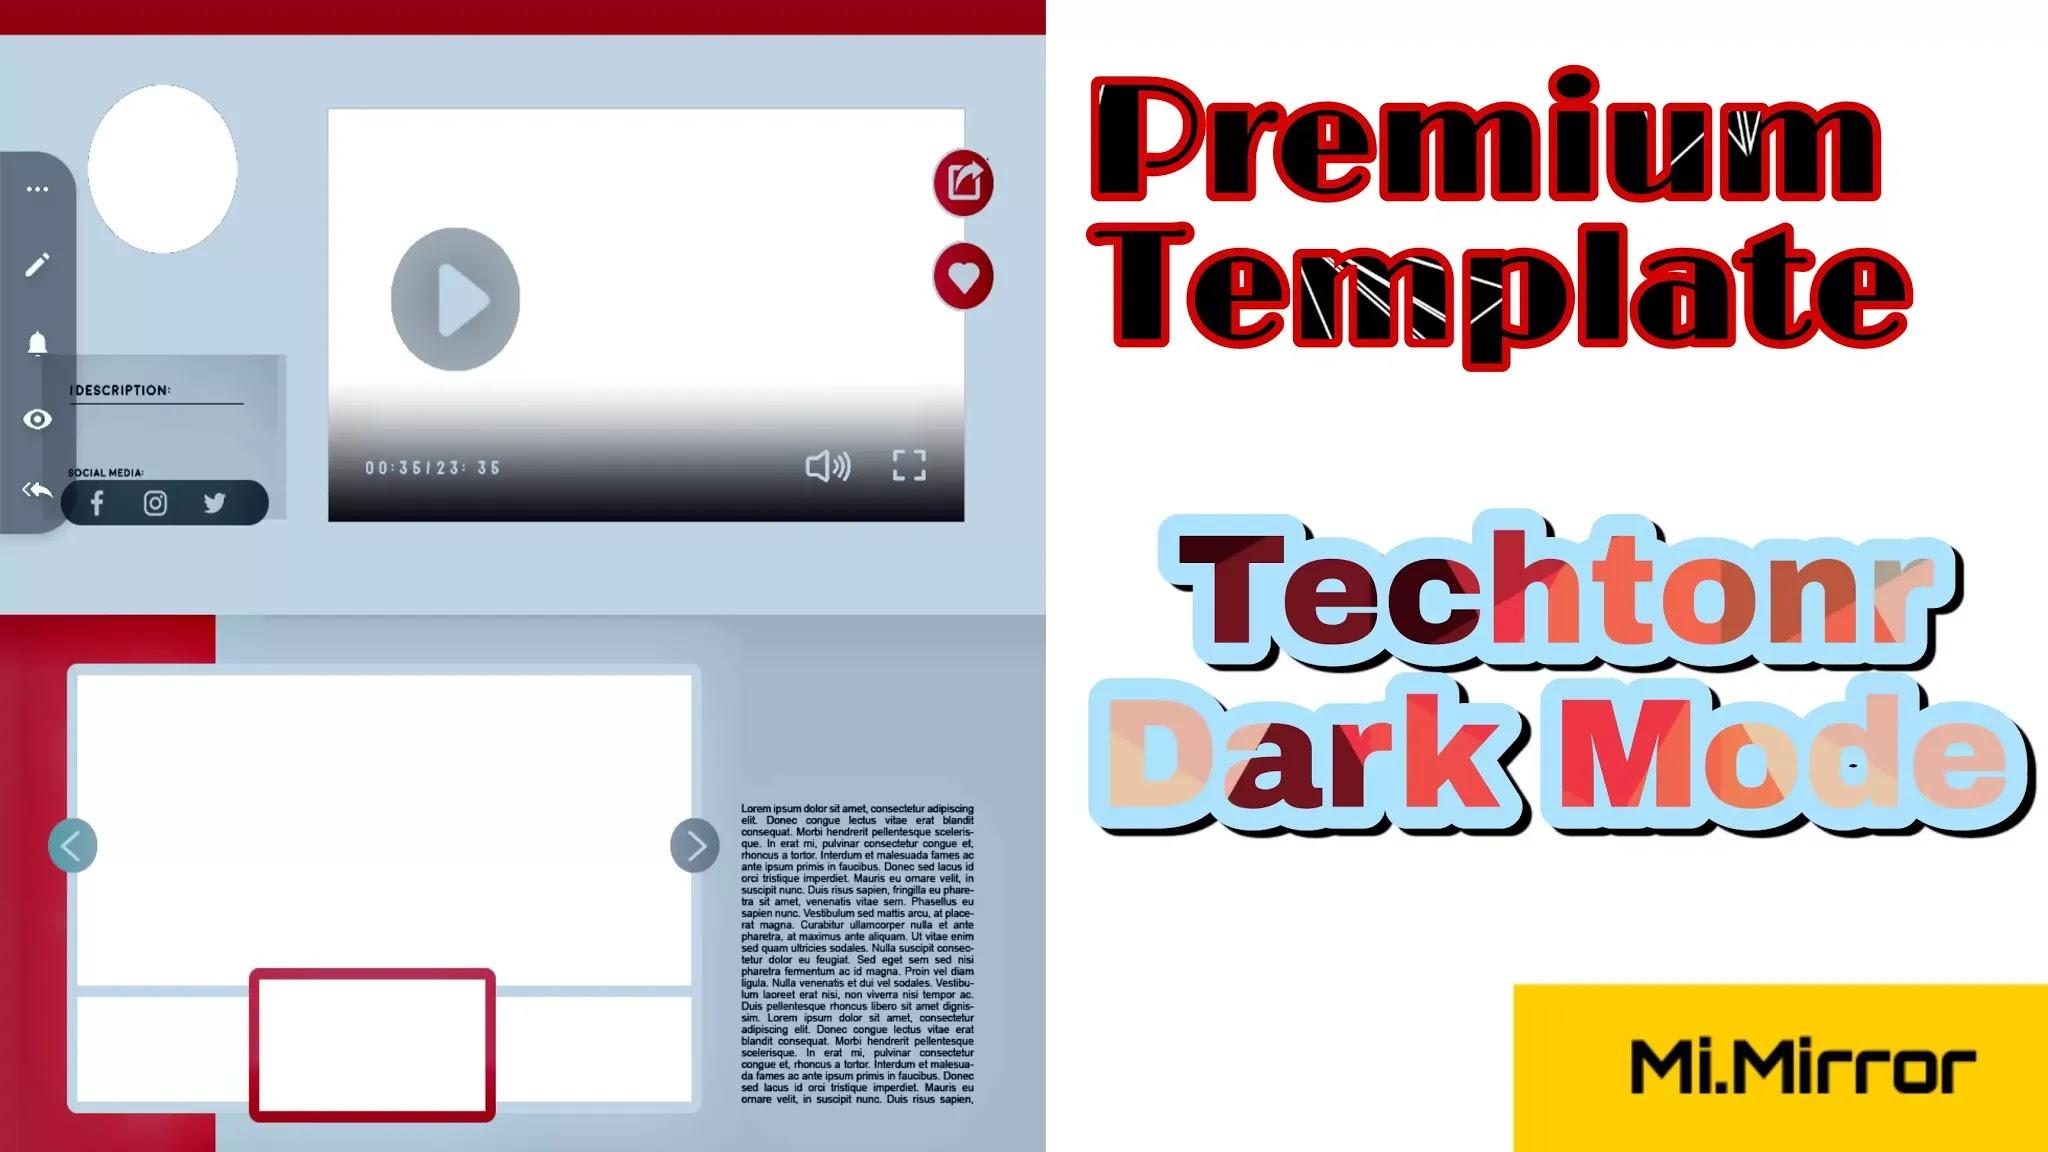 Mironiyar,Techtonr,Dark,mode,Free,seo,Mobile Friendly,Blogger,Theme,Responsive,Template